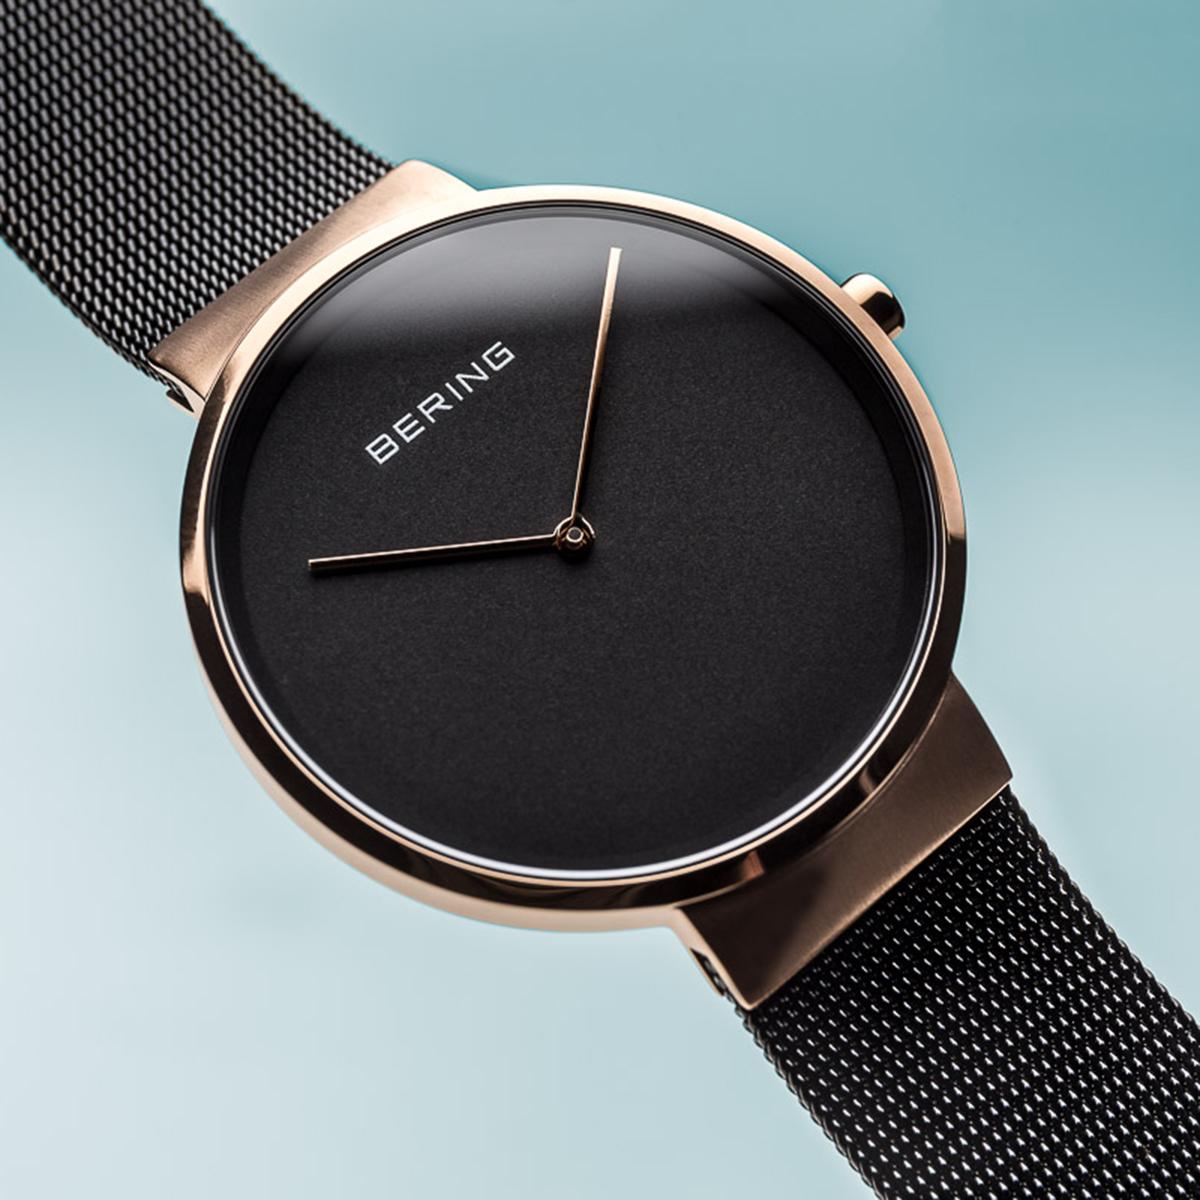 Zegarek damski Bering classic 14539-166 - duże 3